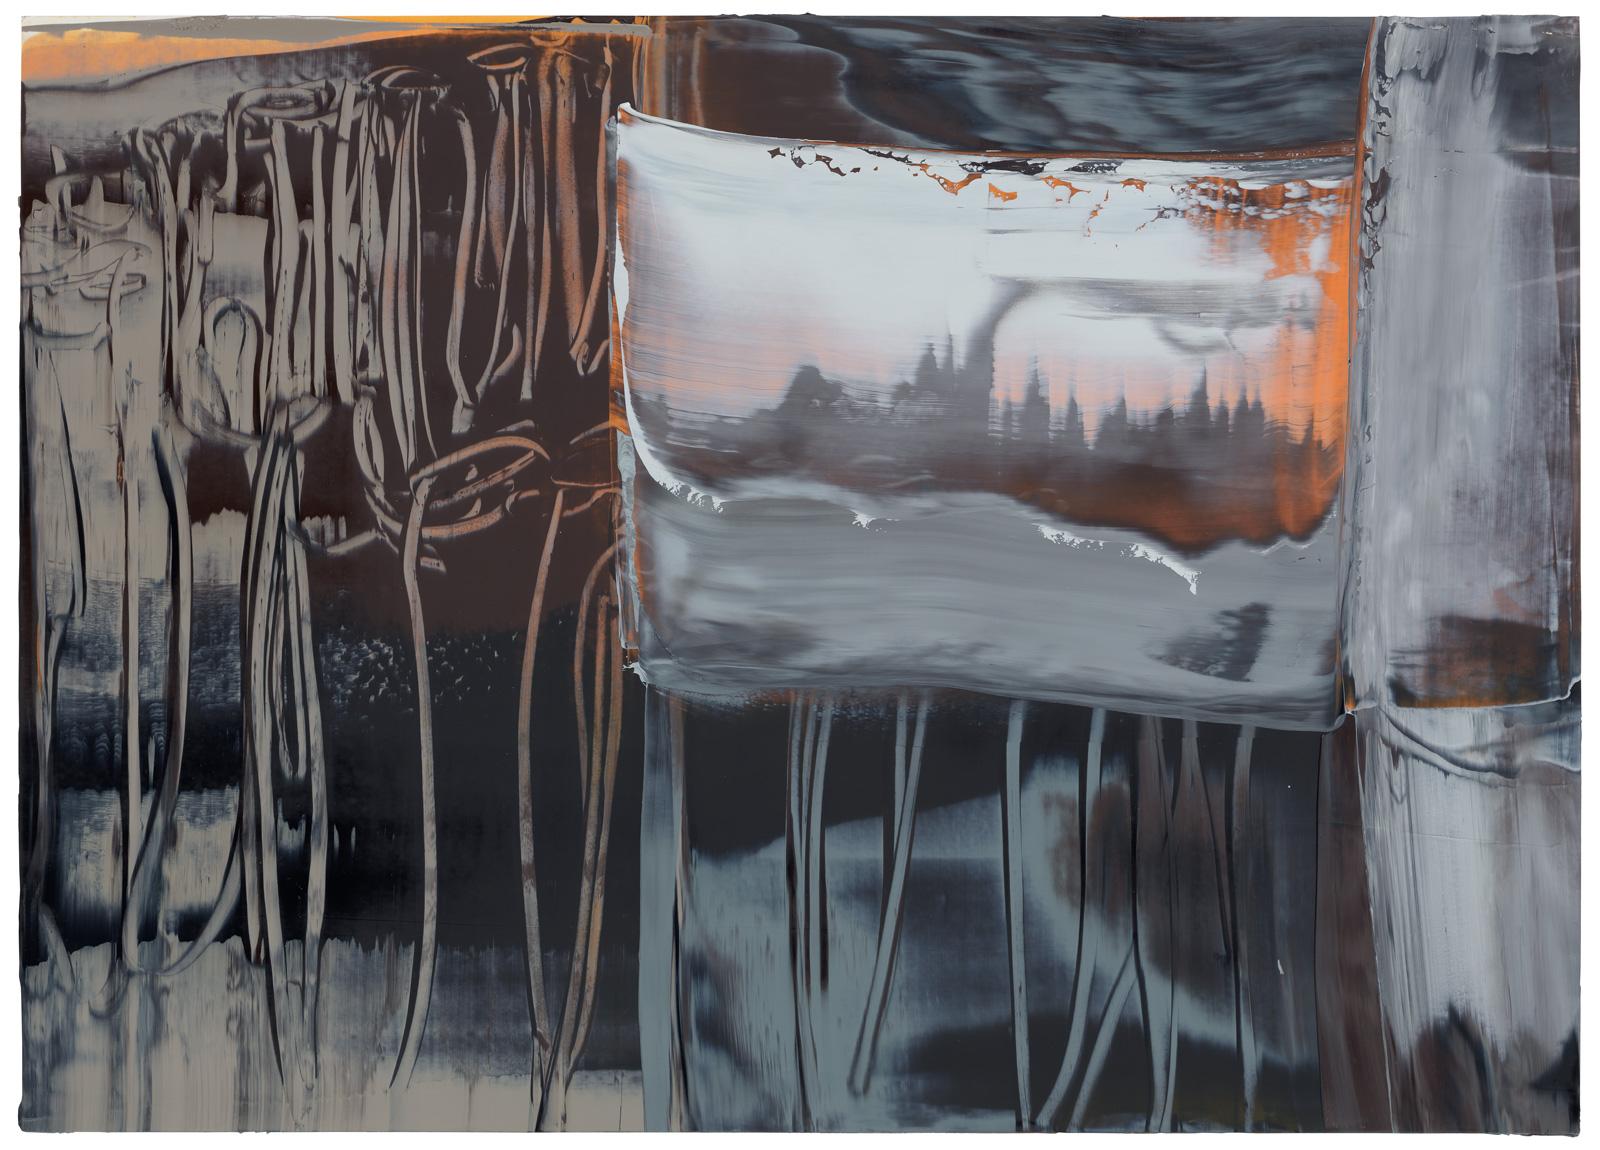 Phragmokon, 2019, Öl auf Papier, 50x70cm, 2019